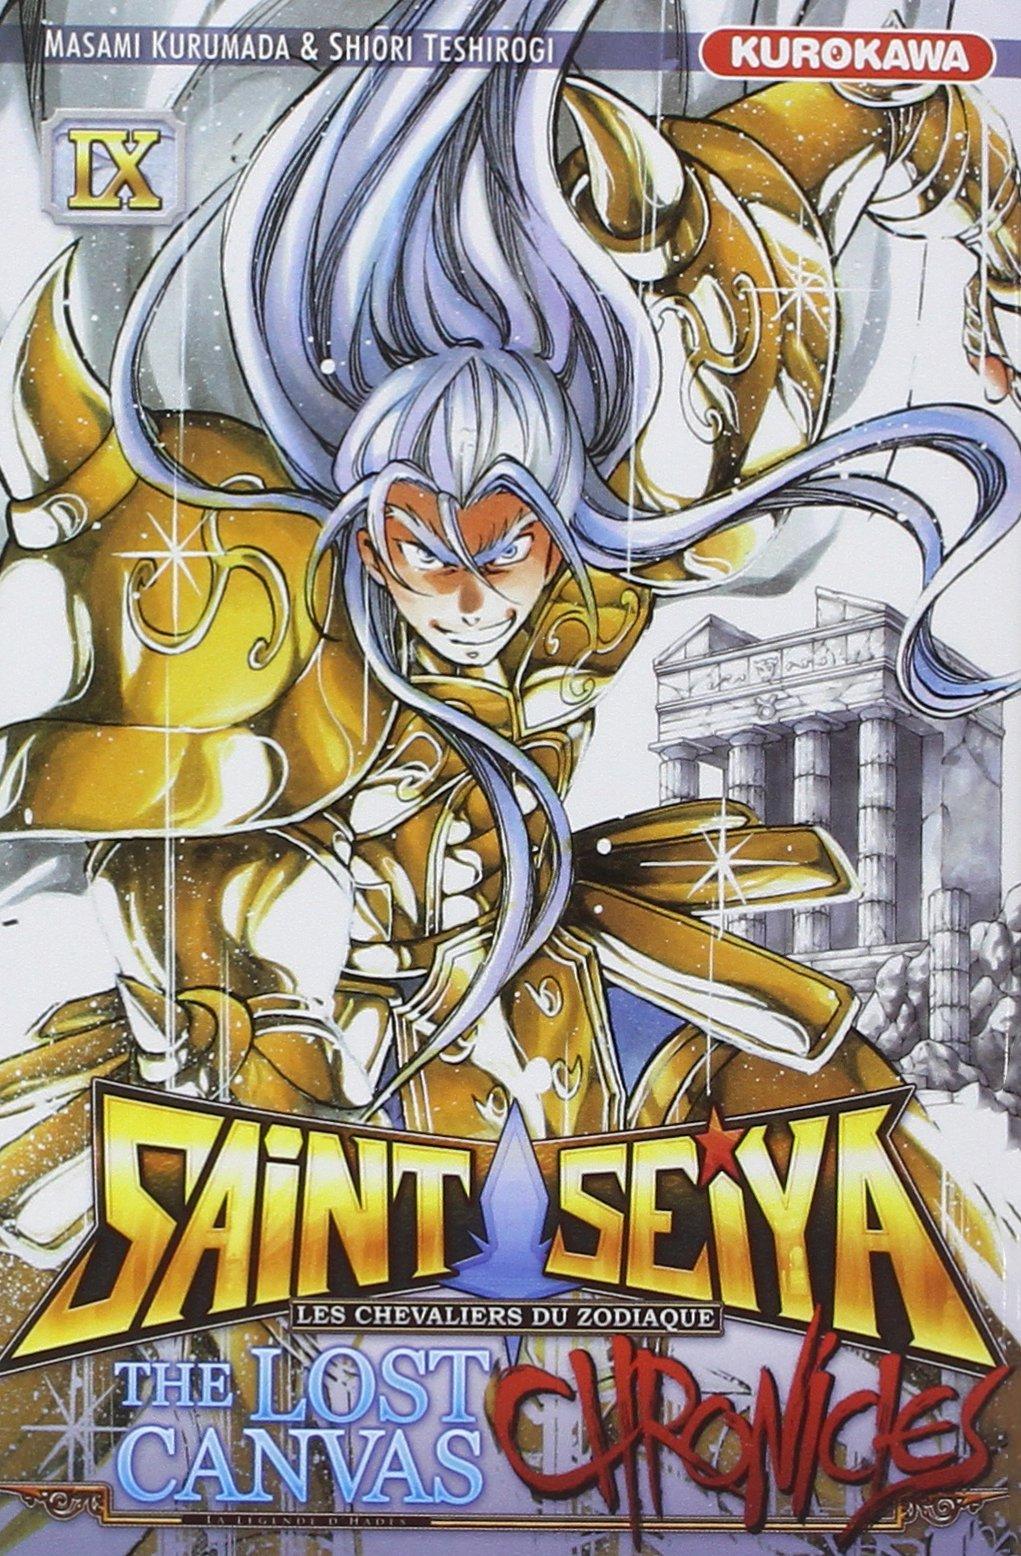 Saint Seya : The Lost Canvas, vol 9